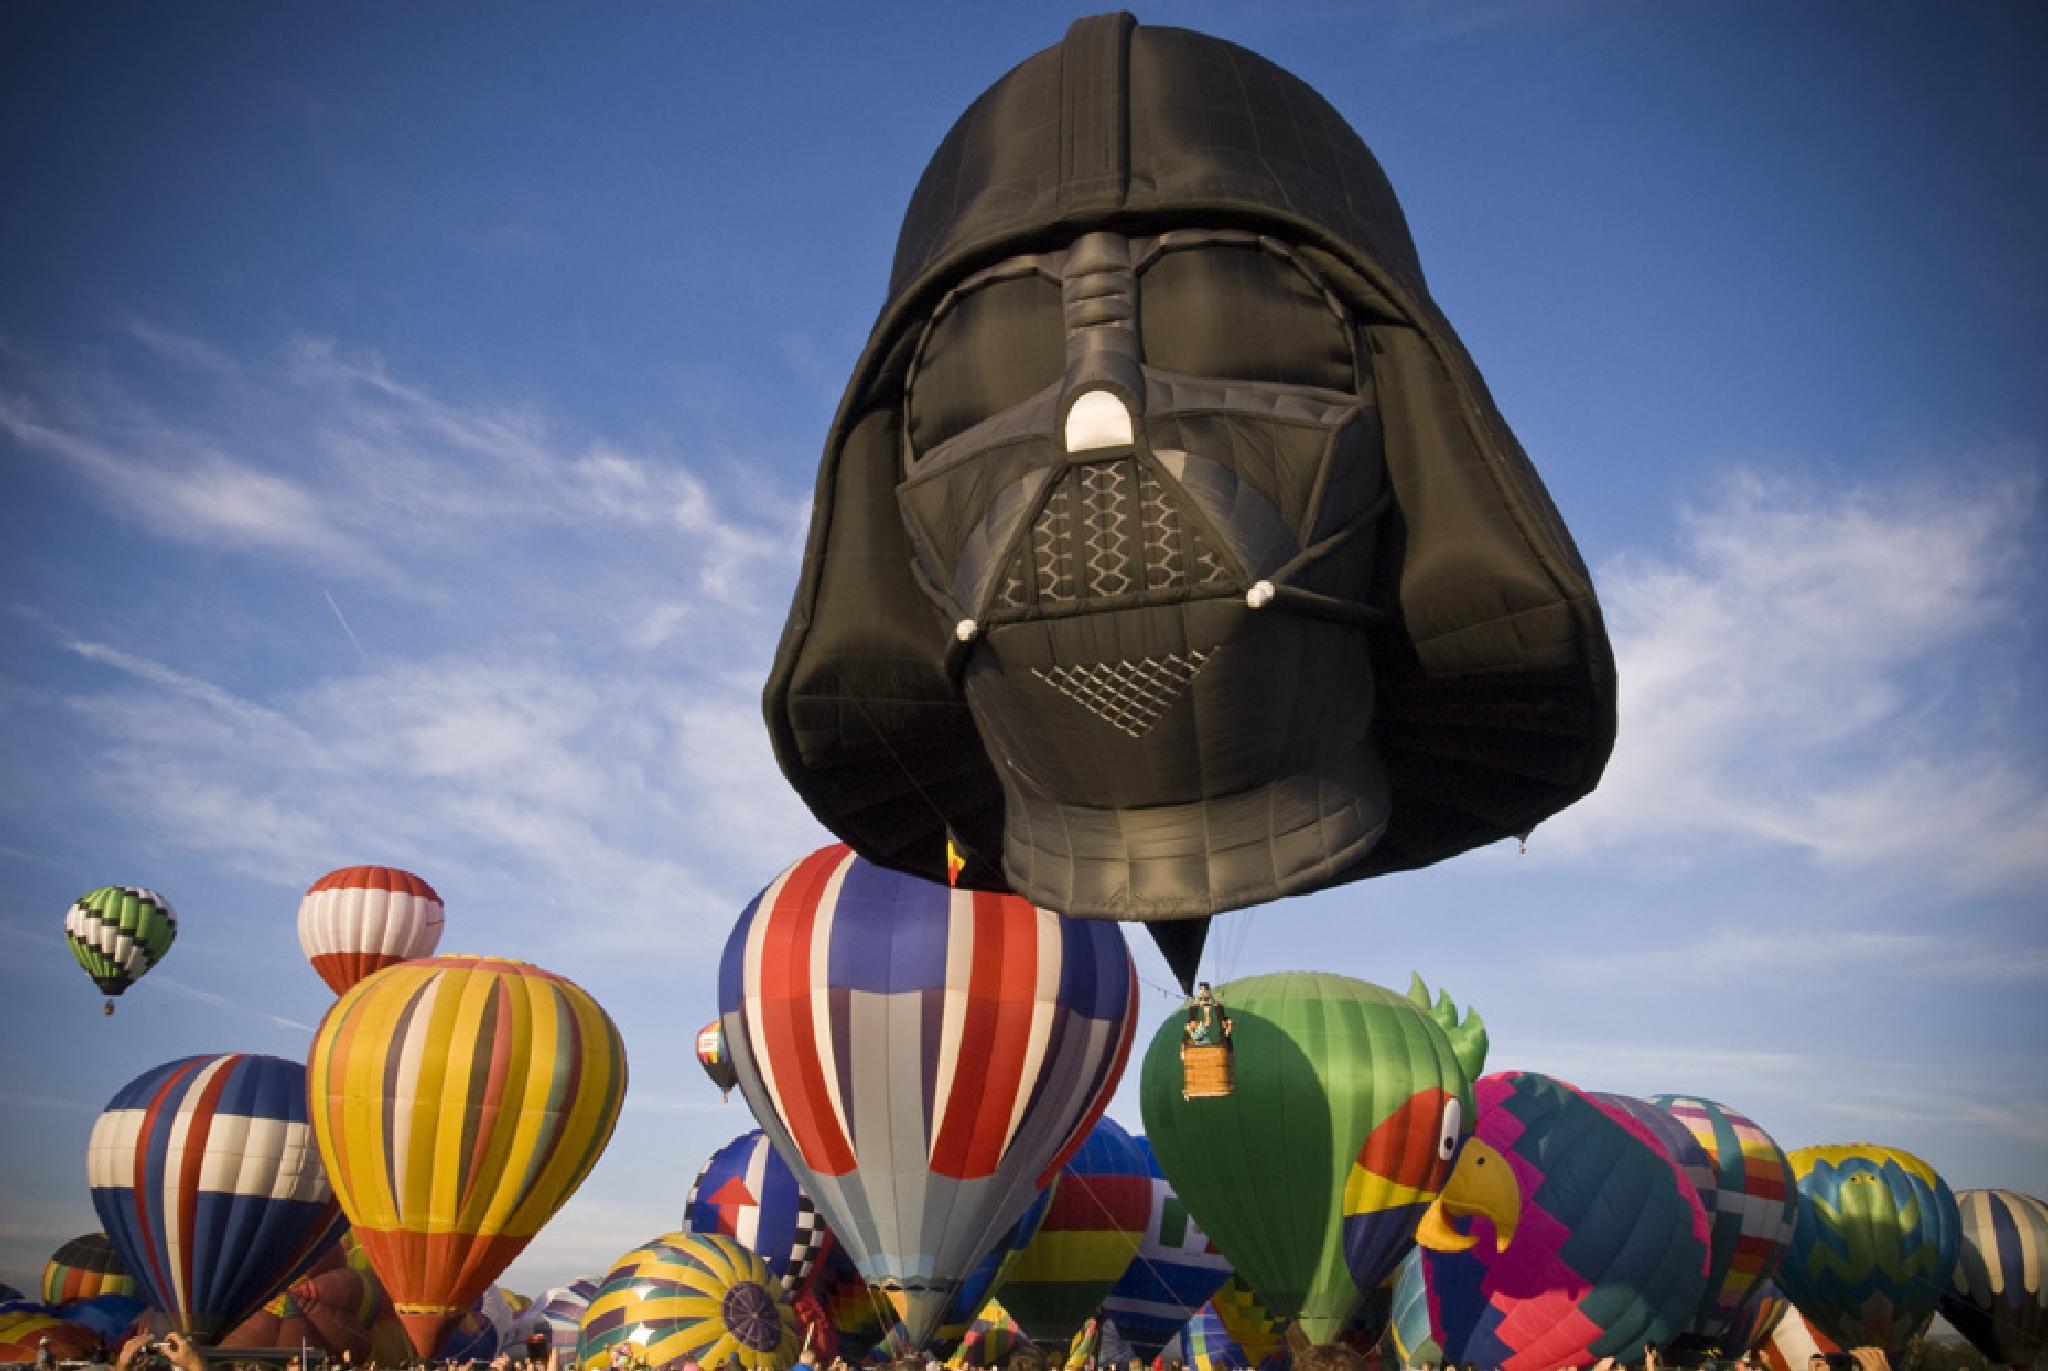 Hot Air Balloon, Darth Vadar by Pazzophoto